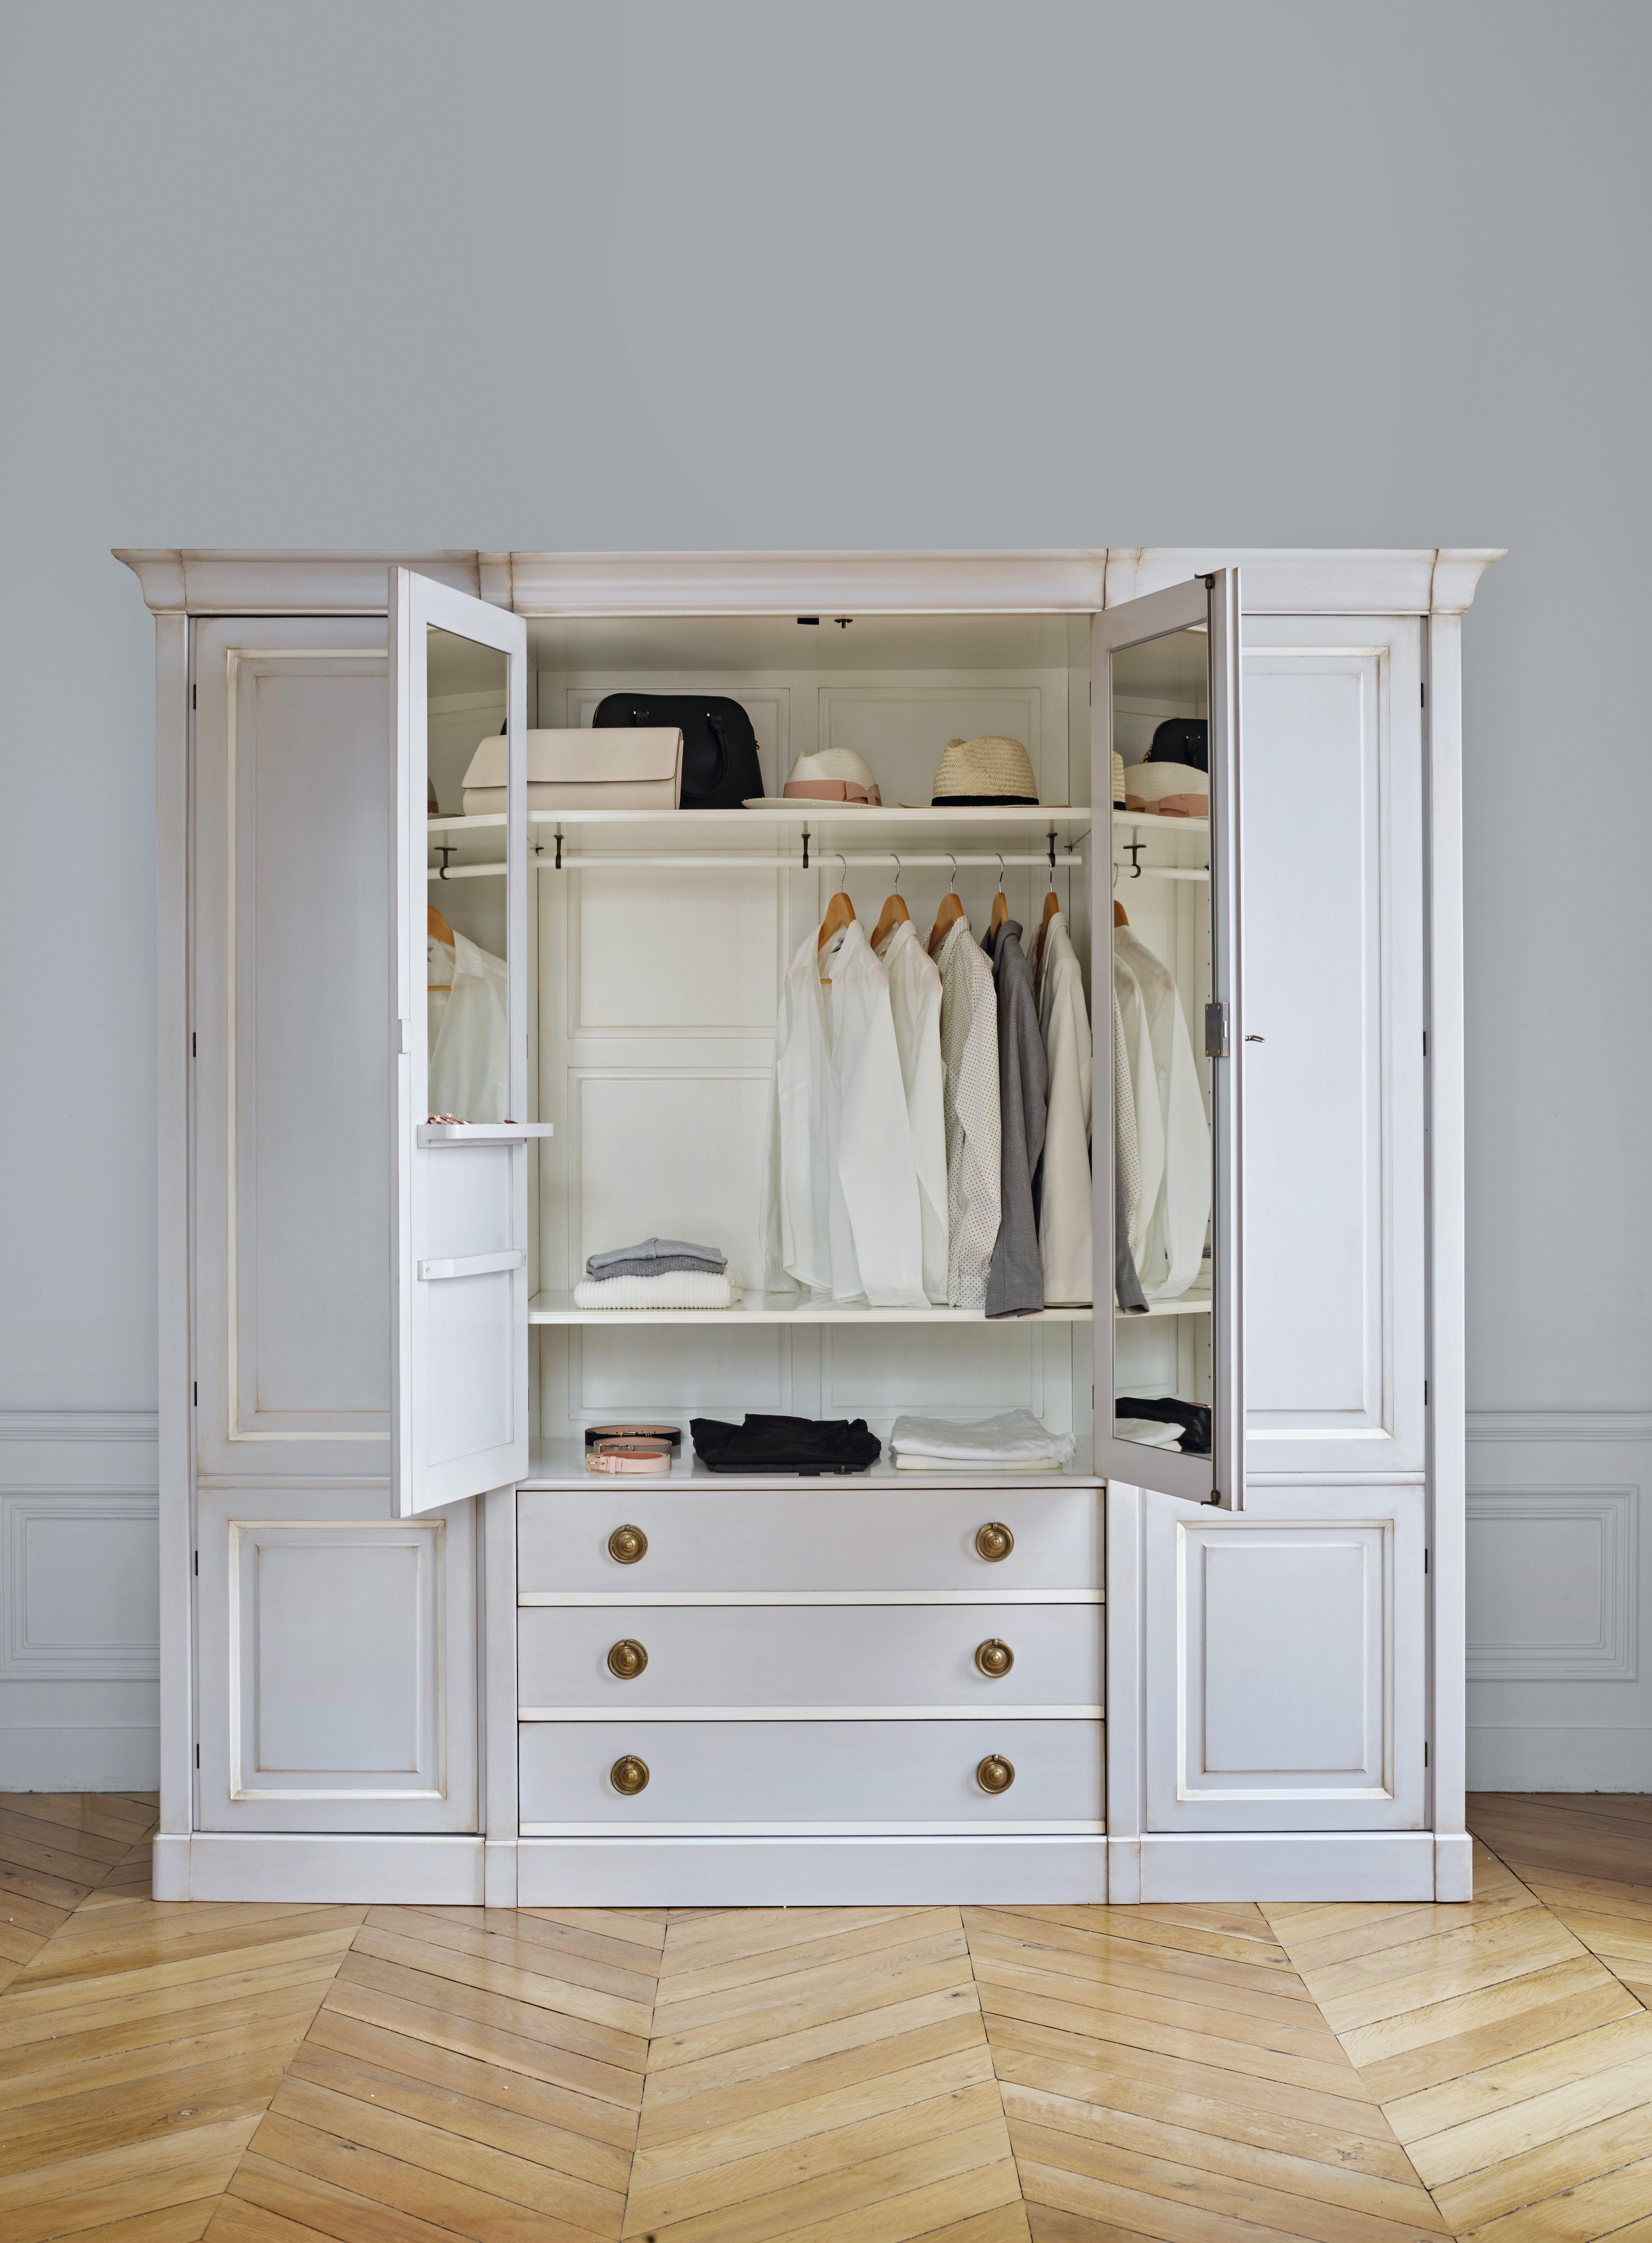 kledingkast - wit houten kledingkast - kledingkast ideeën ...